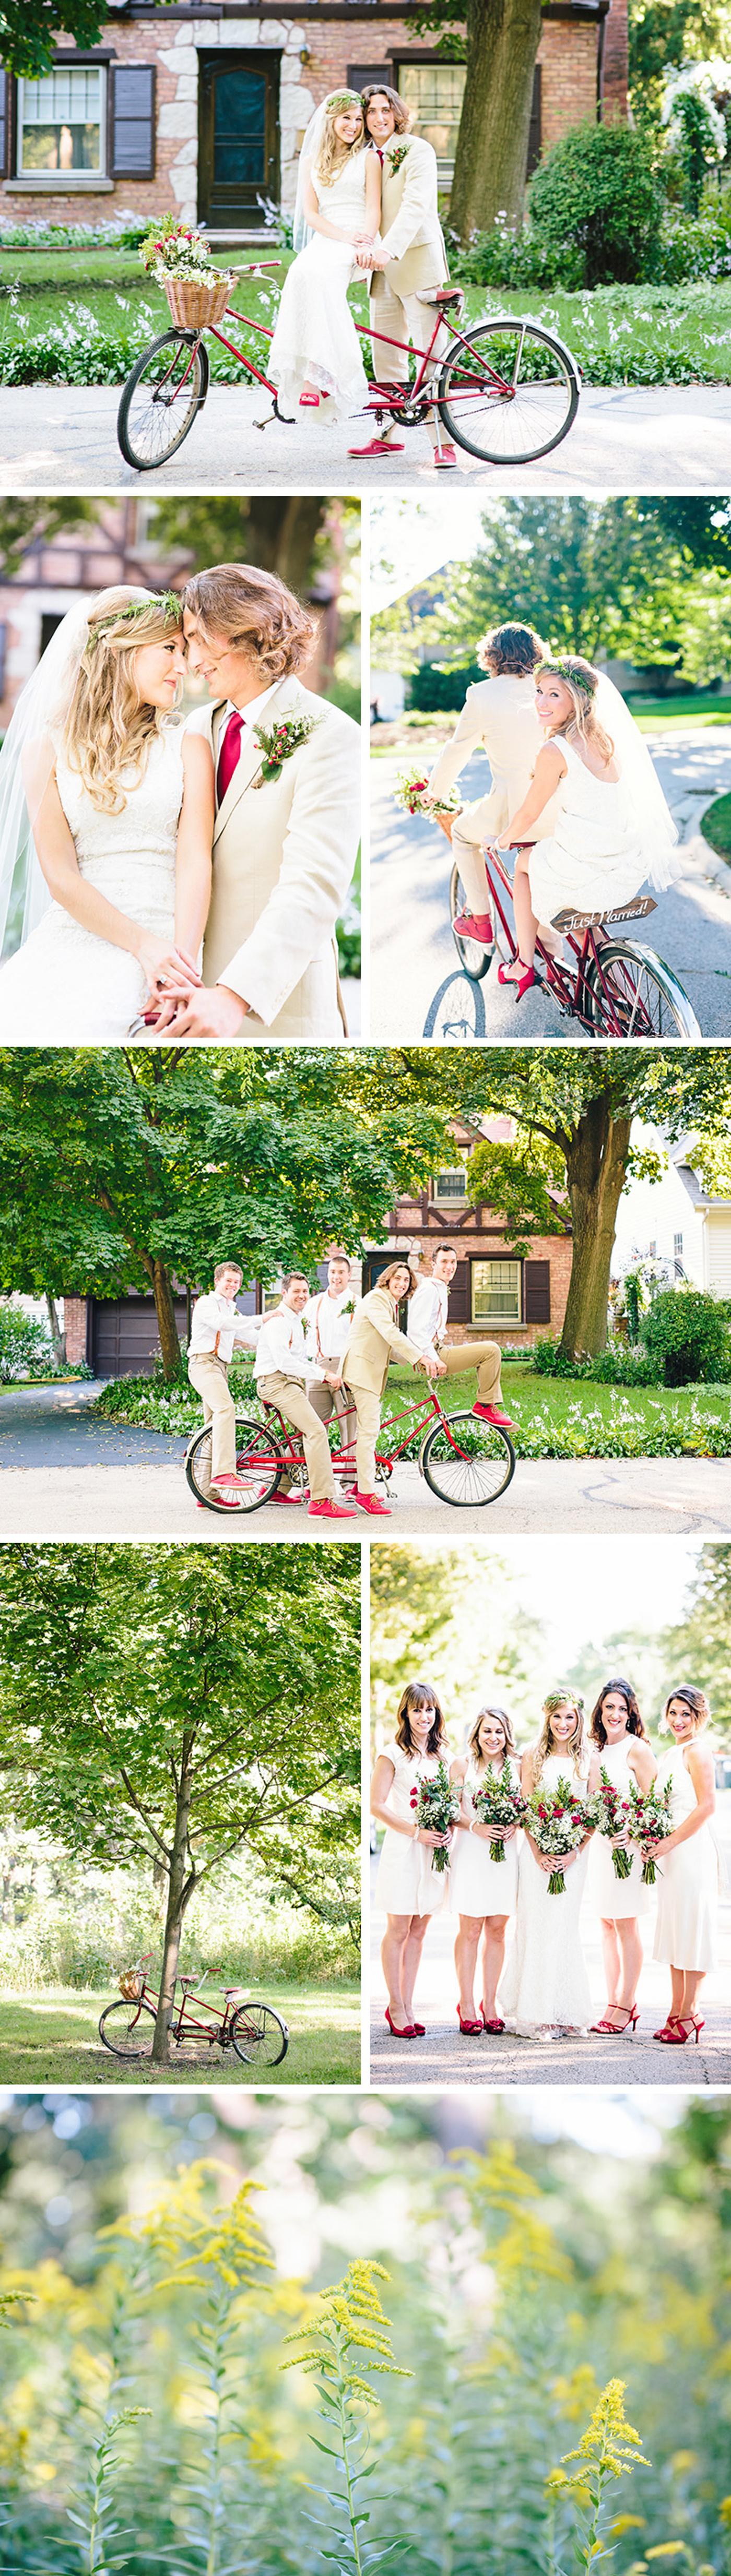 Chicago_Fine_Art_Wedding_Photography_nenn3.jpg